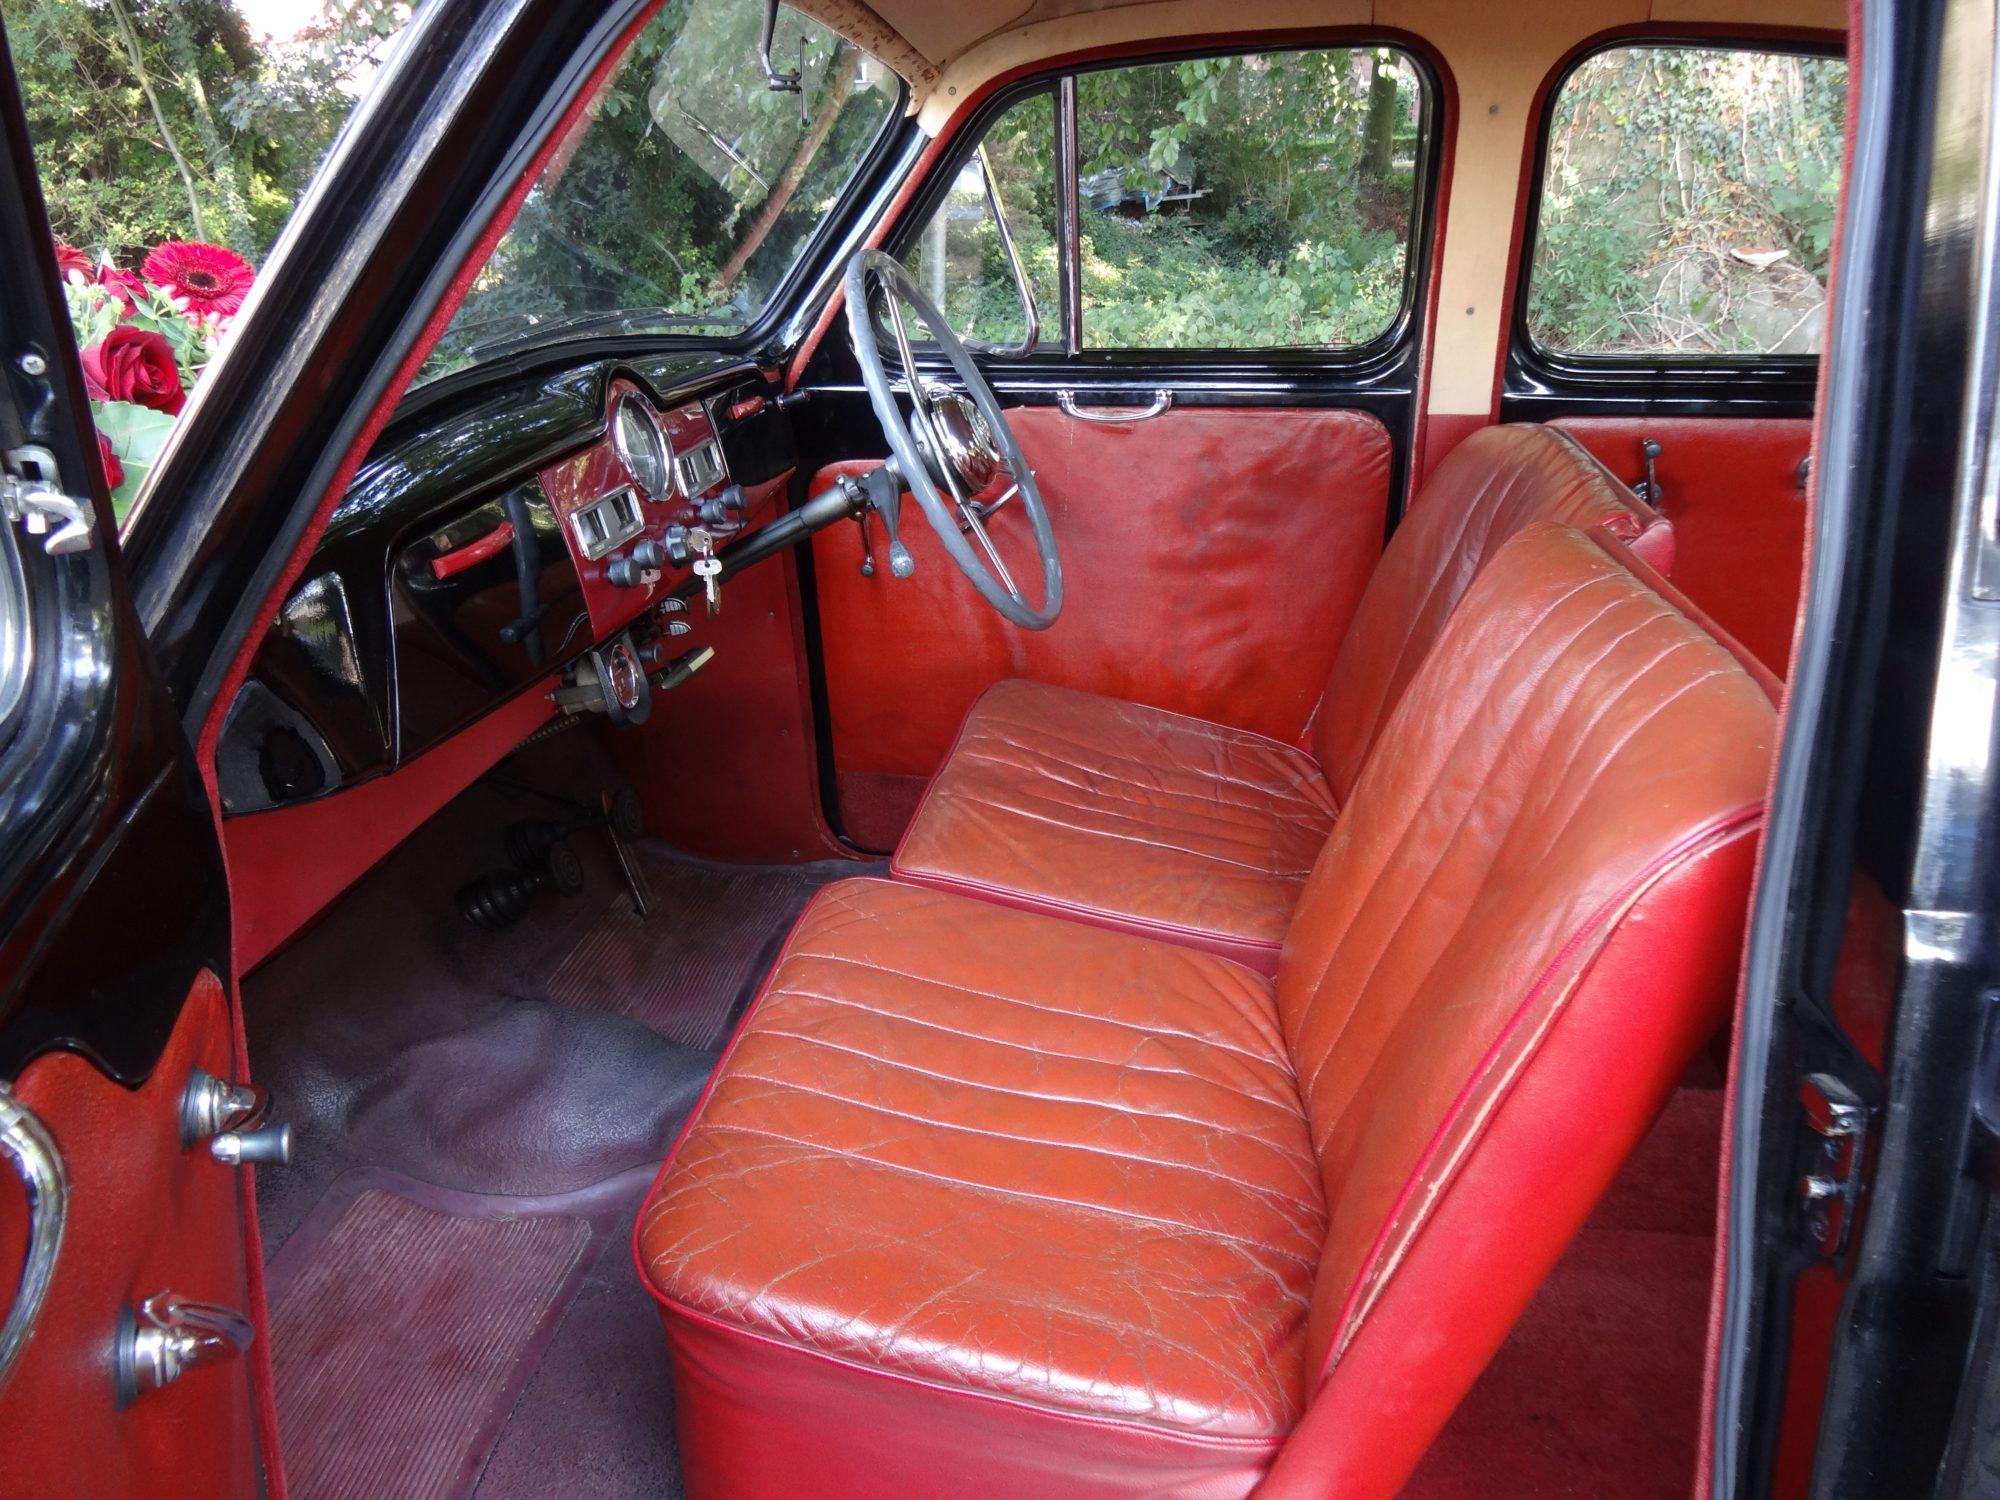 Austin A40 Sommerset interieur